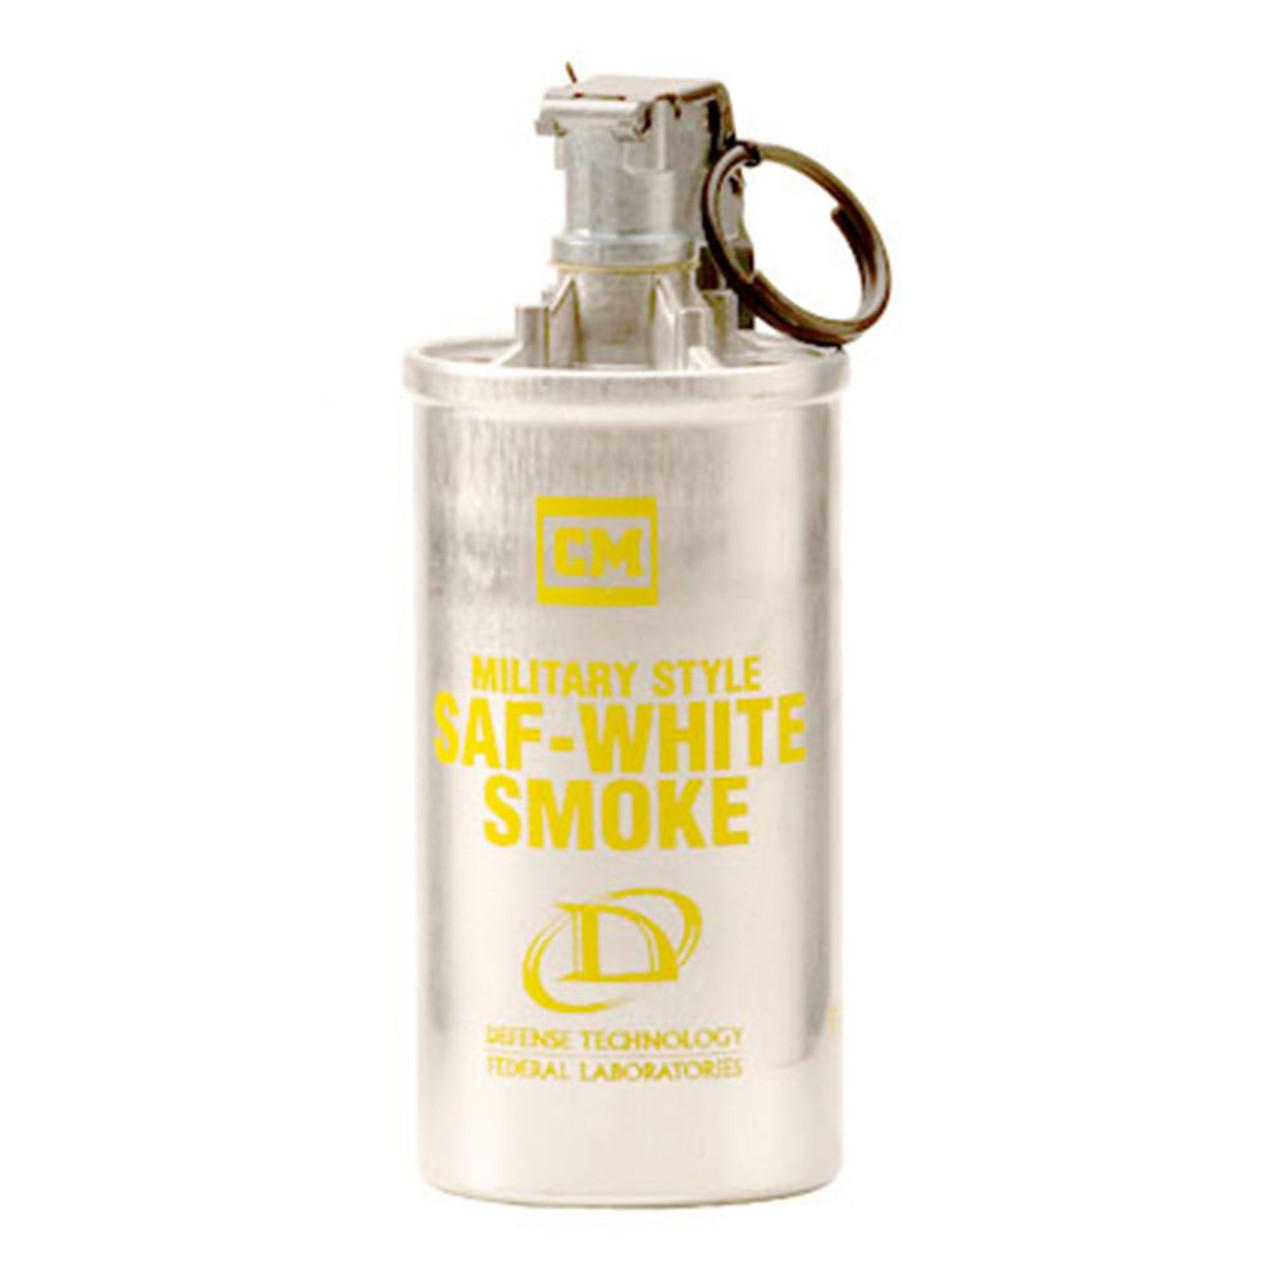 Def Tec Military Style Saf Smoke Grenade Atlantic